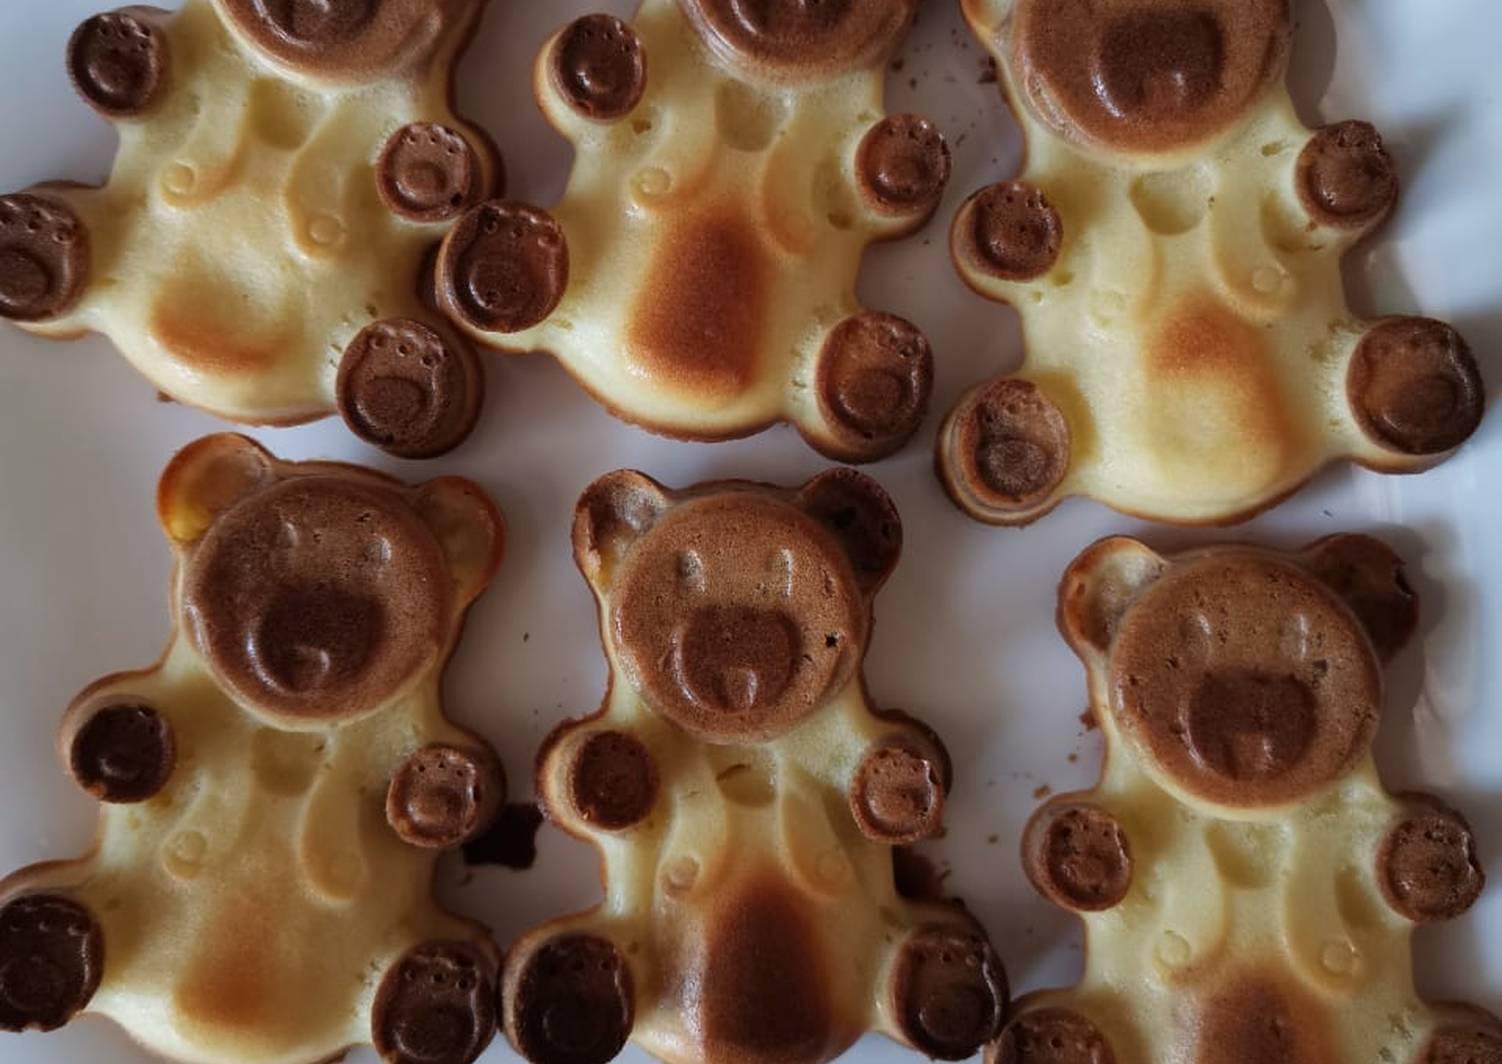 барни по домашнему рецепт с фото приближением